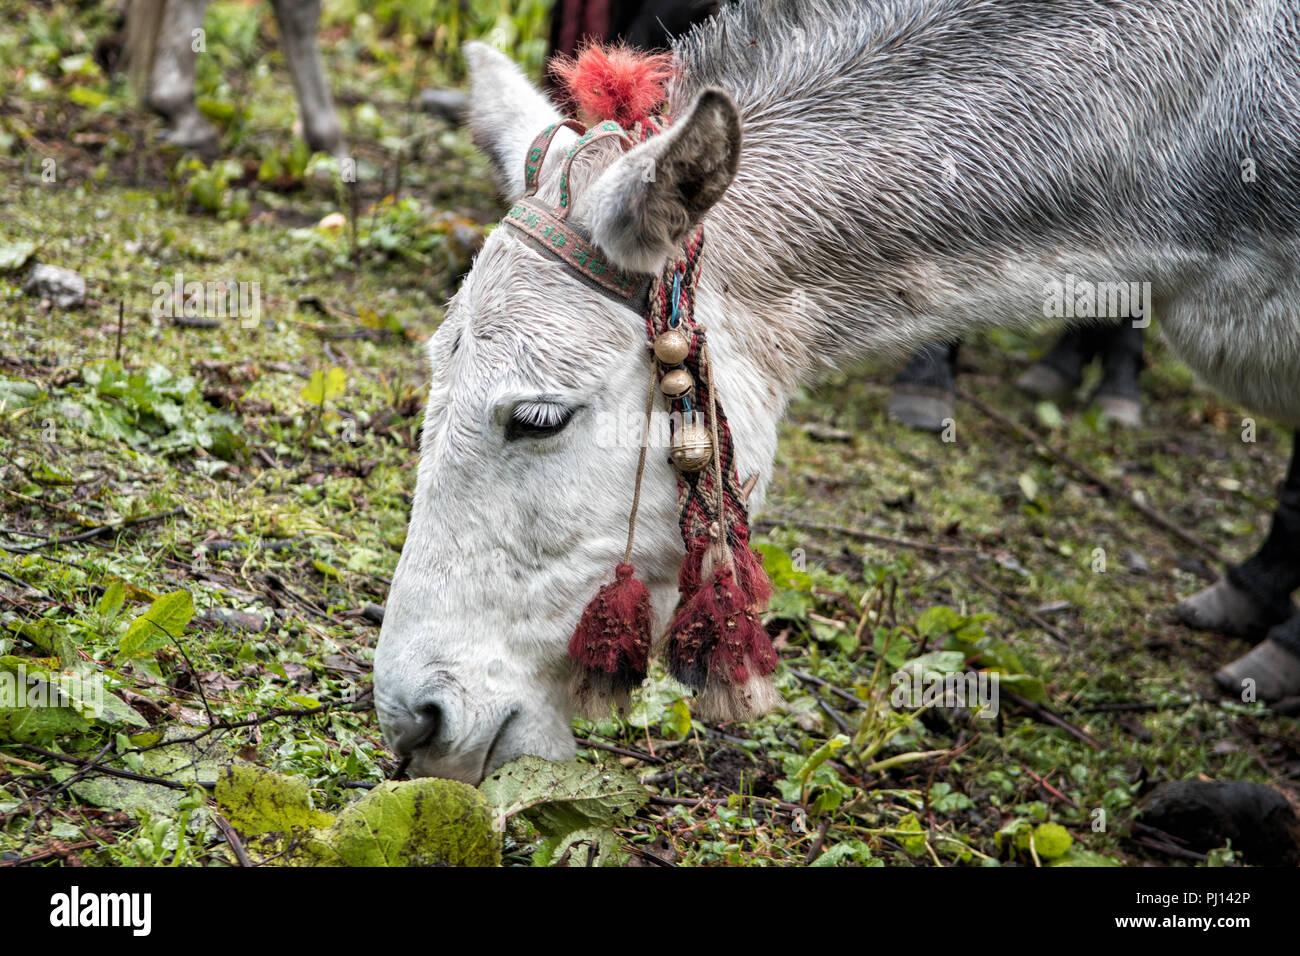 Pack animal at Thongo Zampa camp, Paro District, Snowman Trek, Bhutan Stock Photo